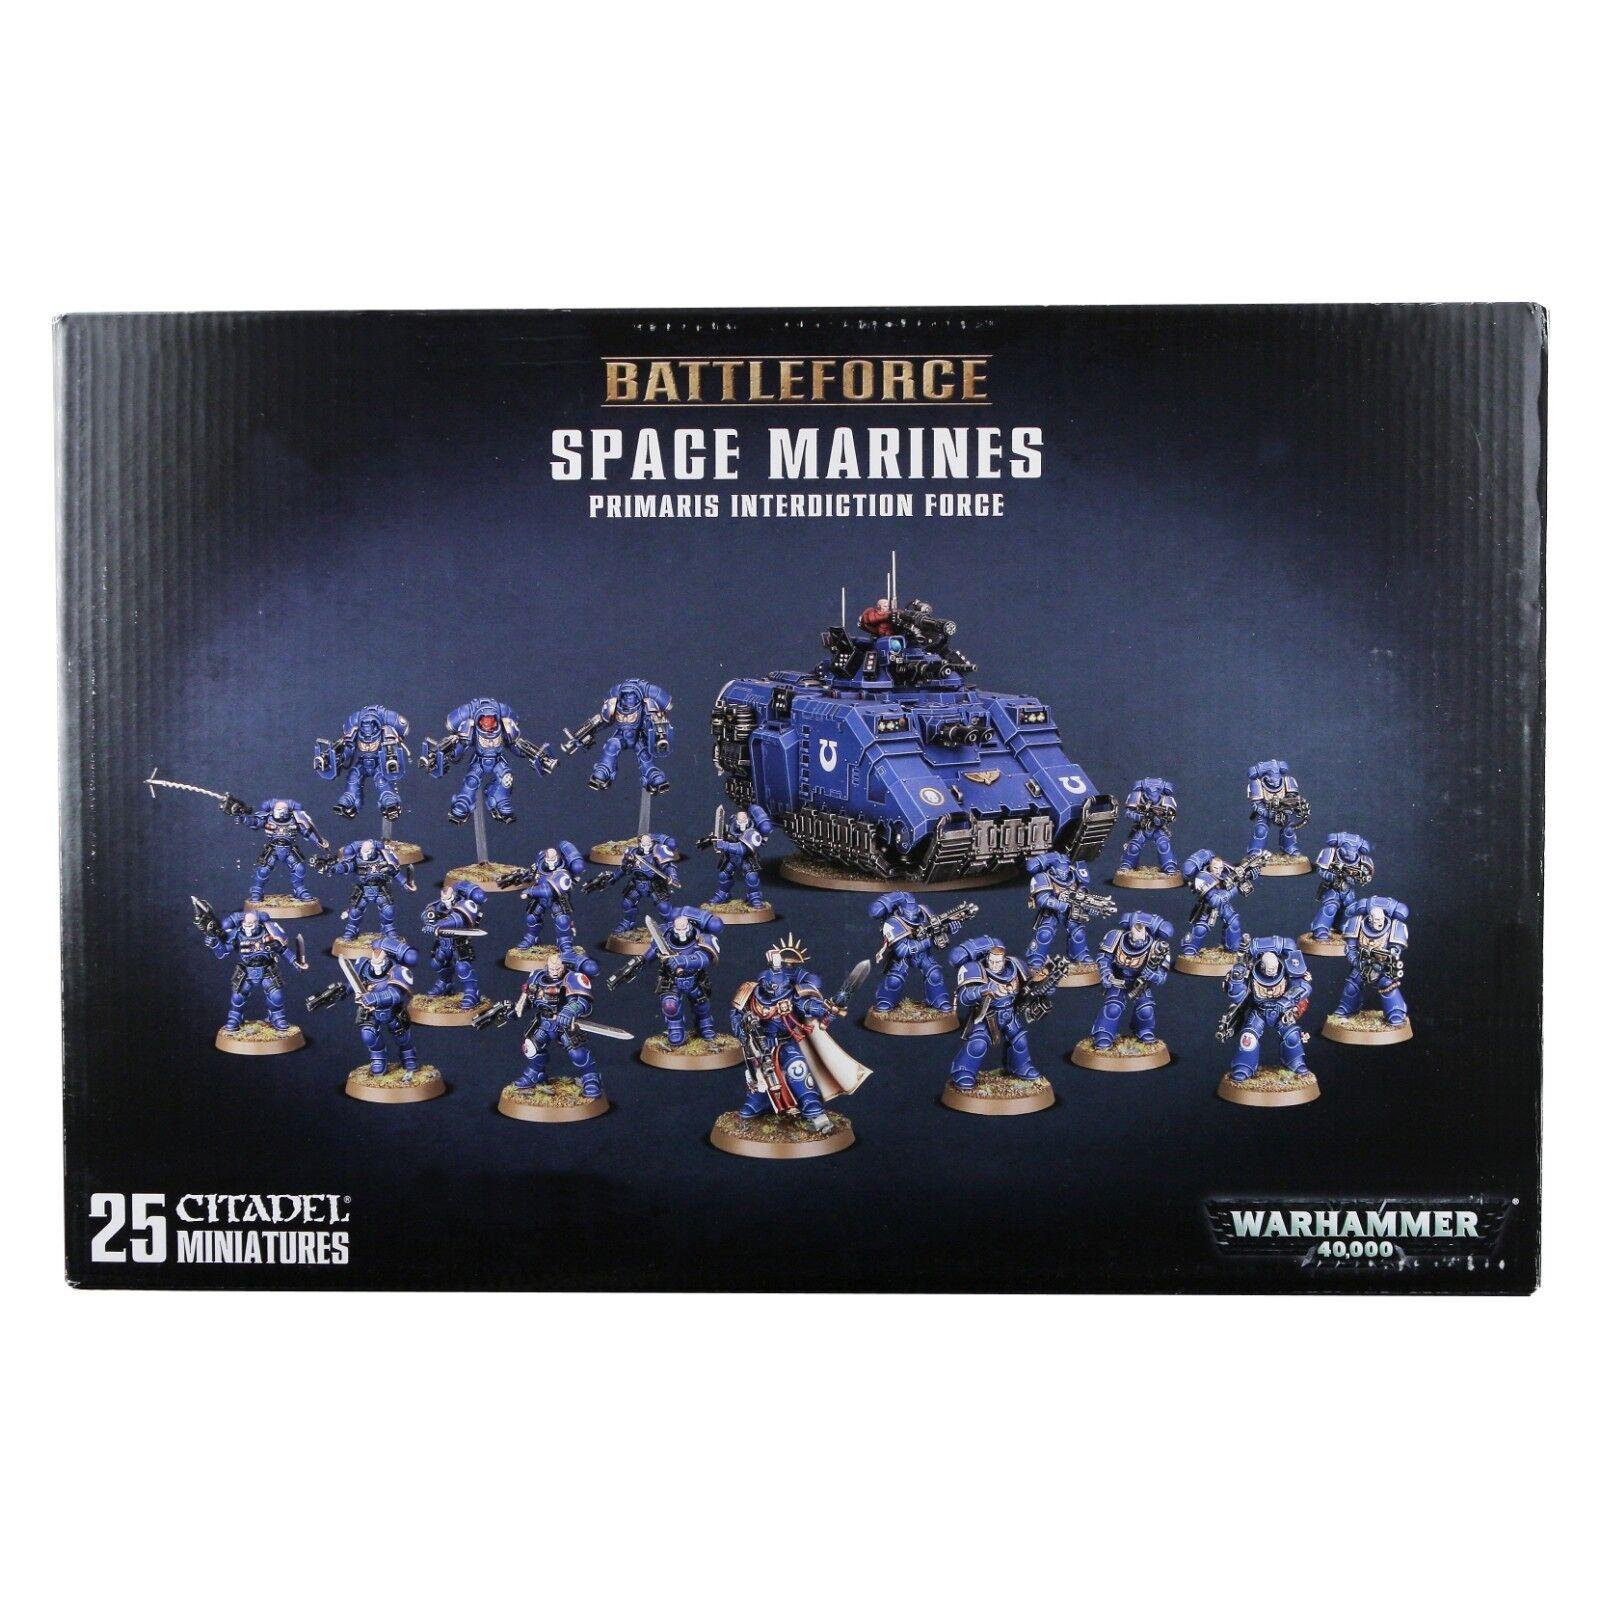 Space Marines Ultramarines Primaris Interdiction Force Warhammer 40,000 11839